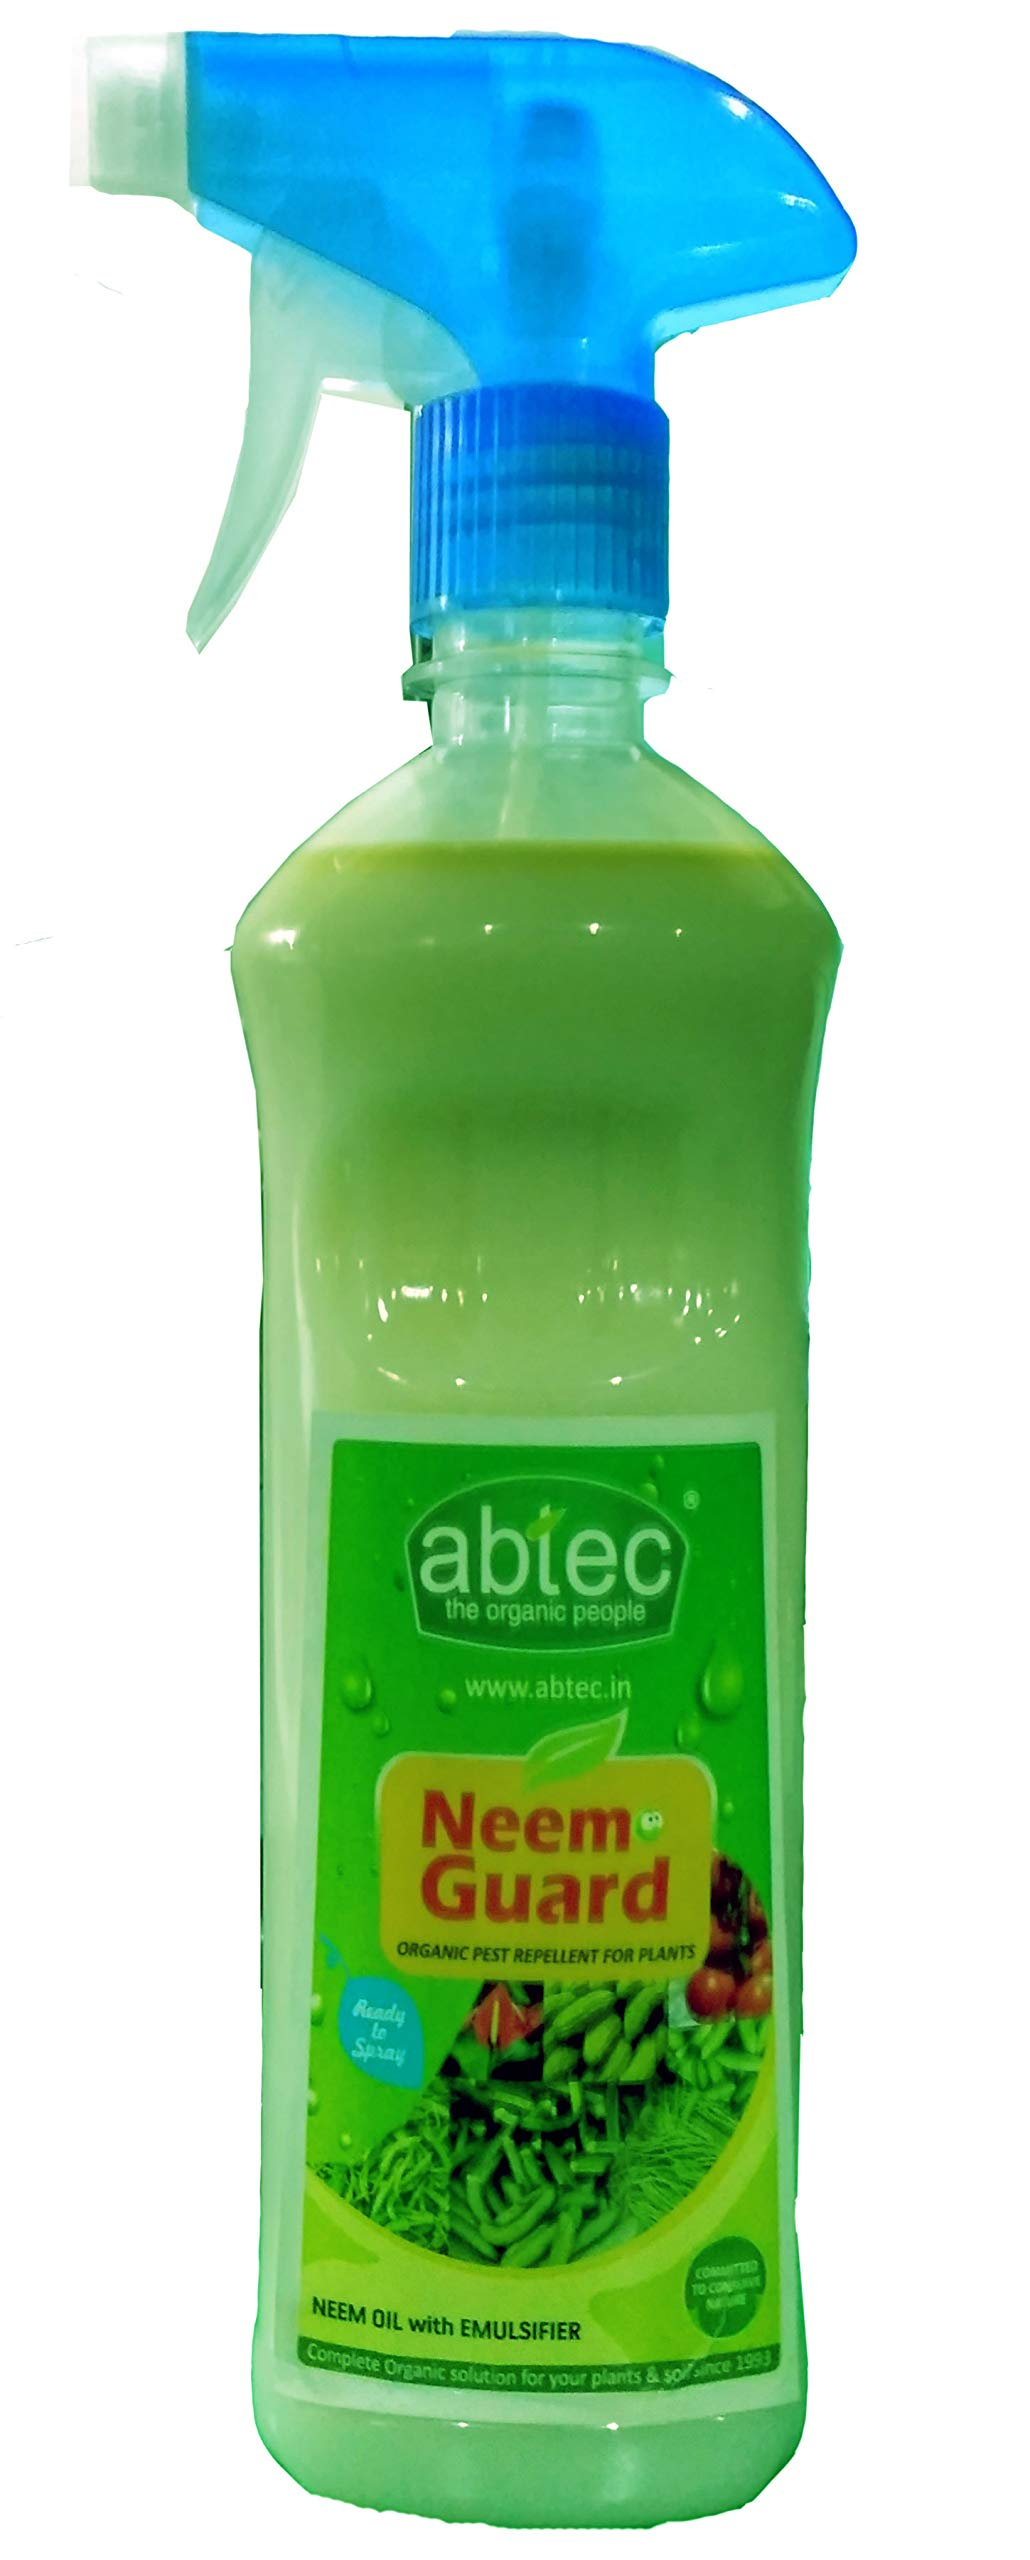 Abtec Neem Guard Organic Pest Repellent, Neem Fertilizer, Neem Oil for Plants, 500 Ml (B072613W76) Amazon Price History, Amazon Price Tracker